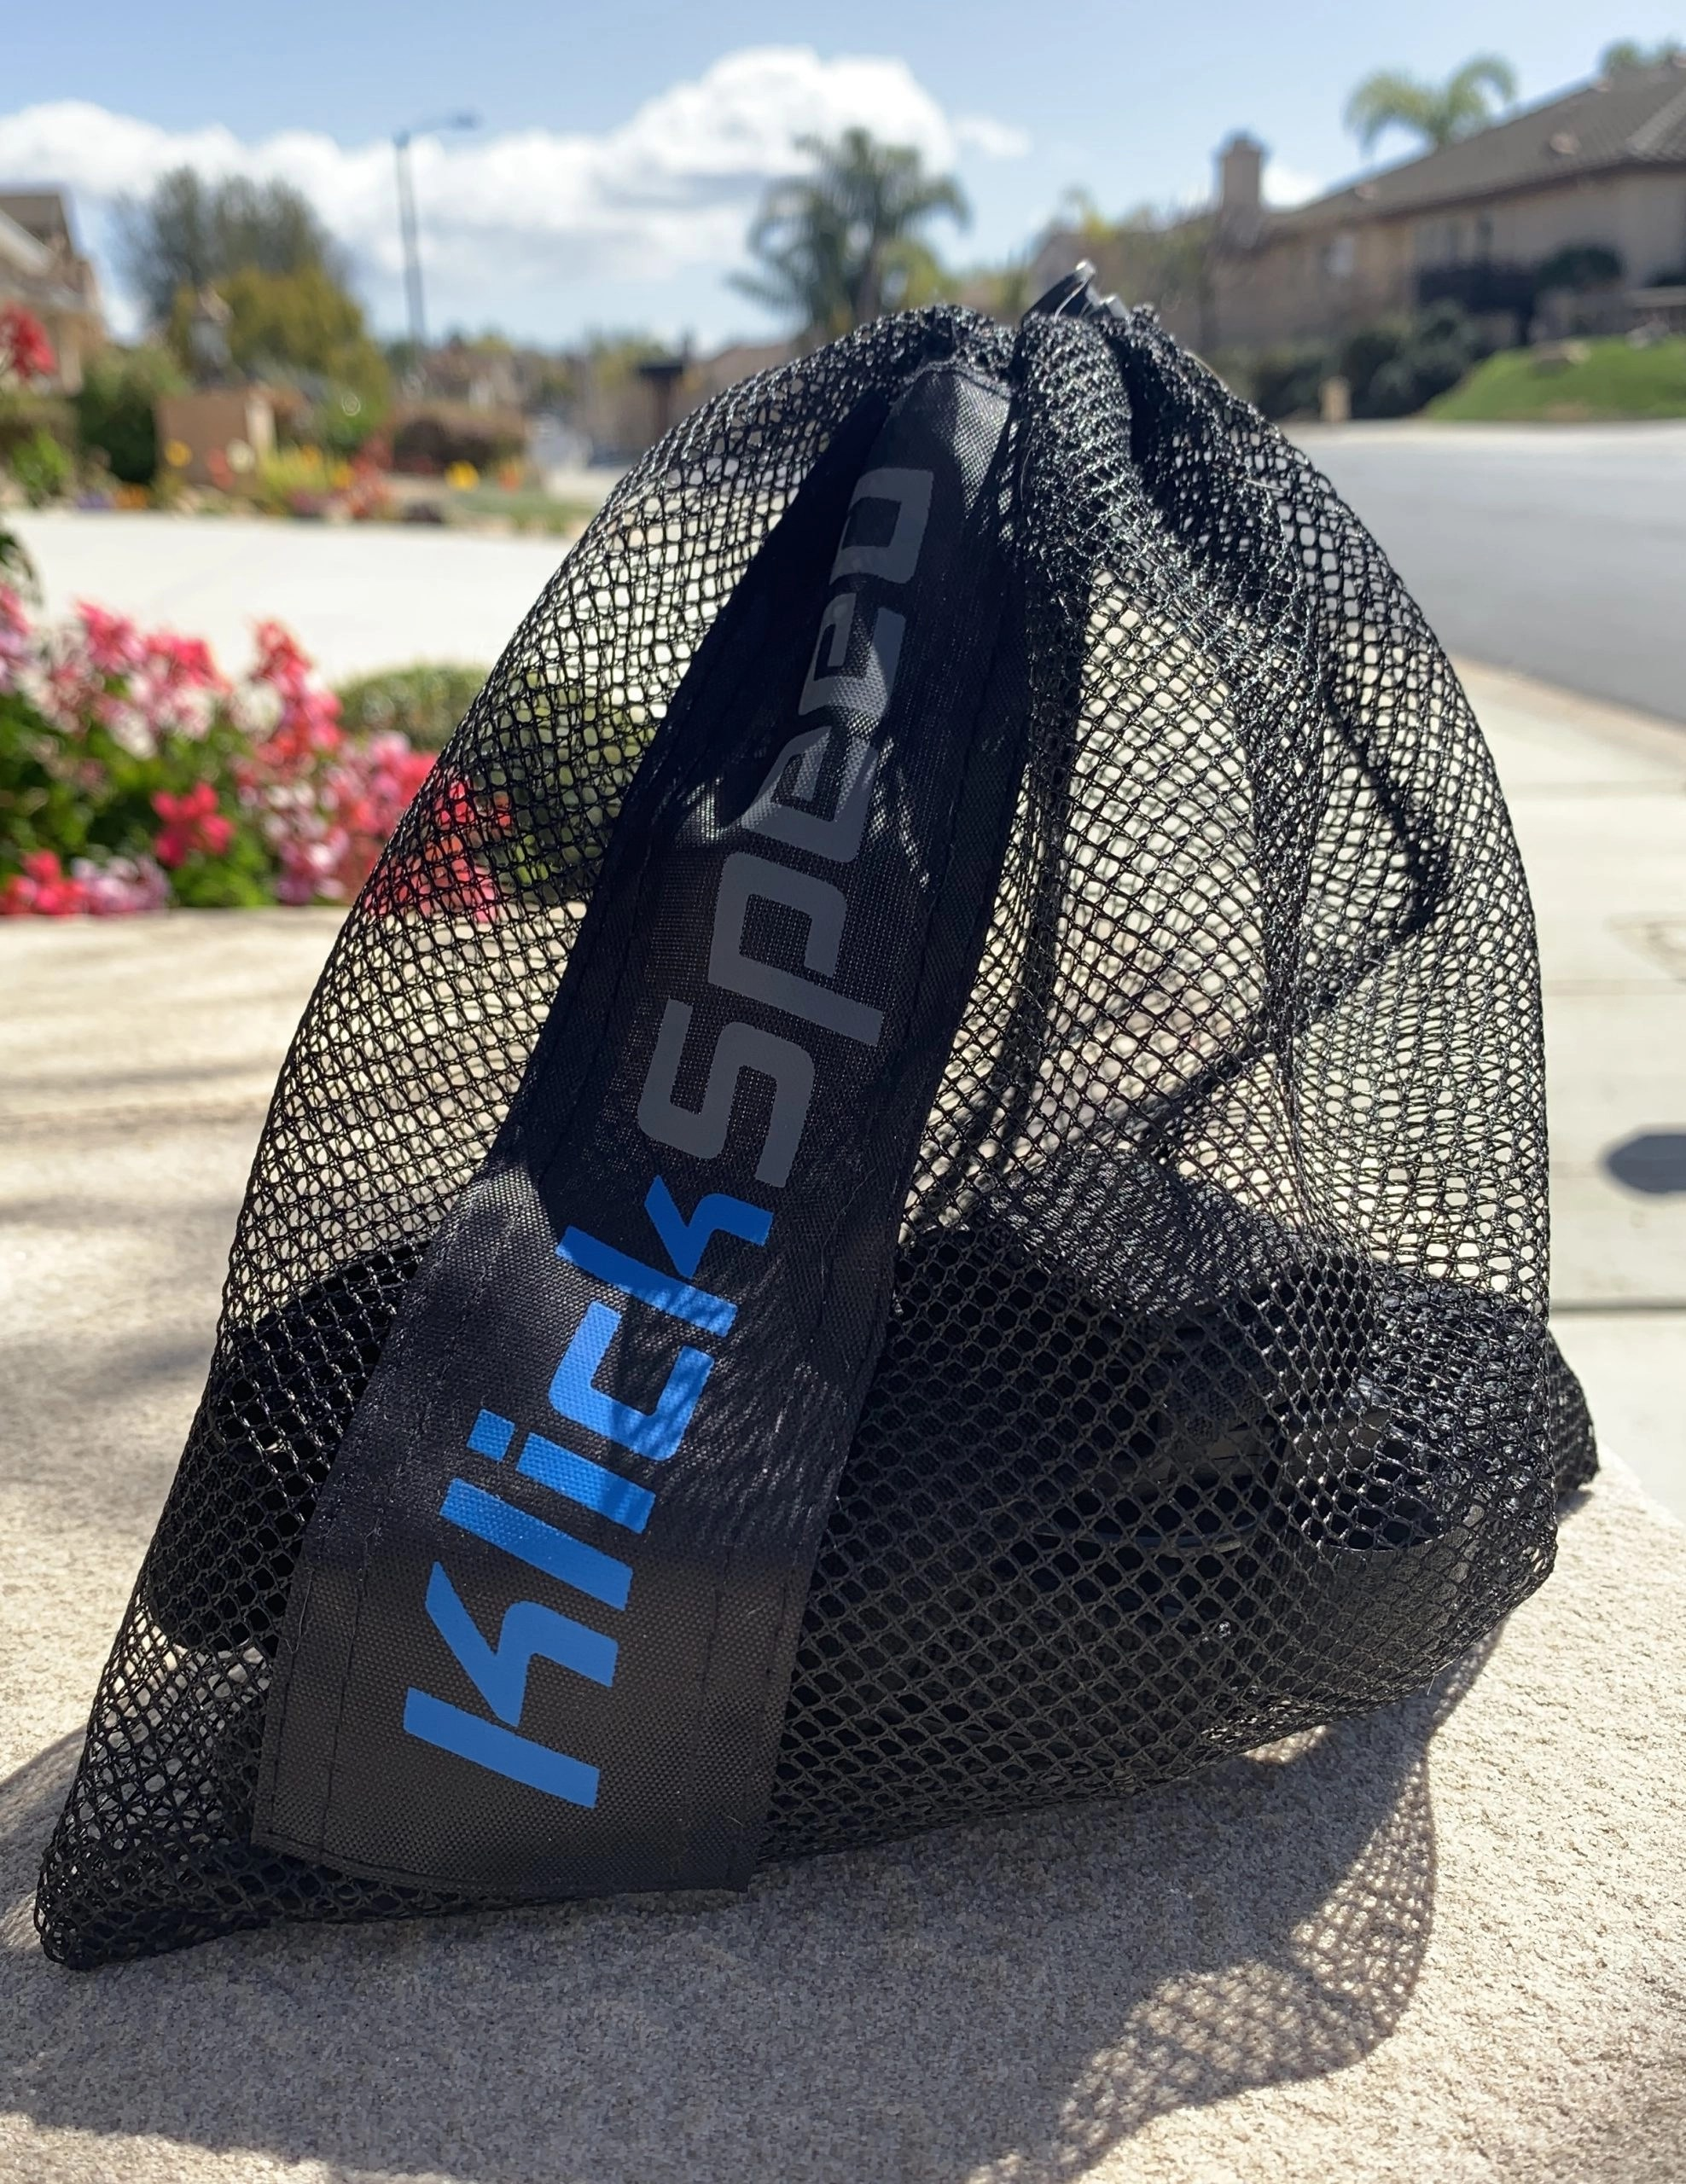 Device in bag